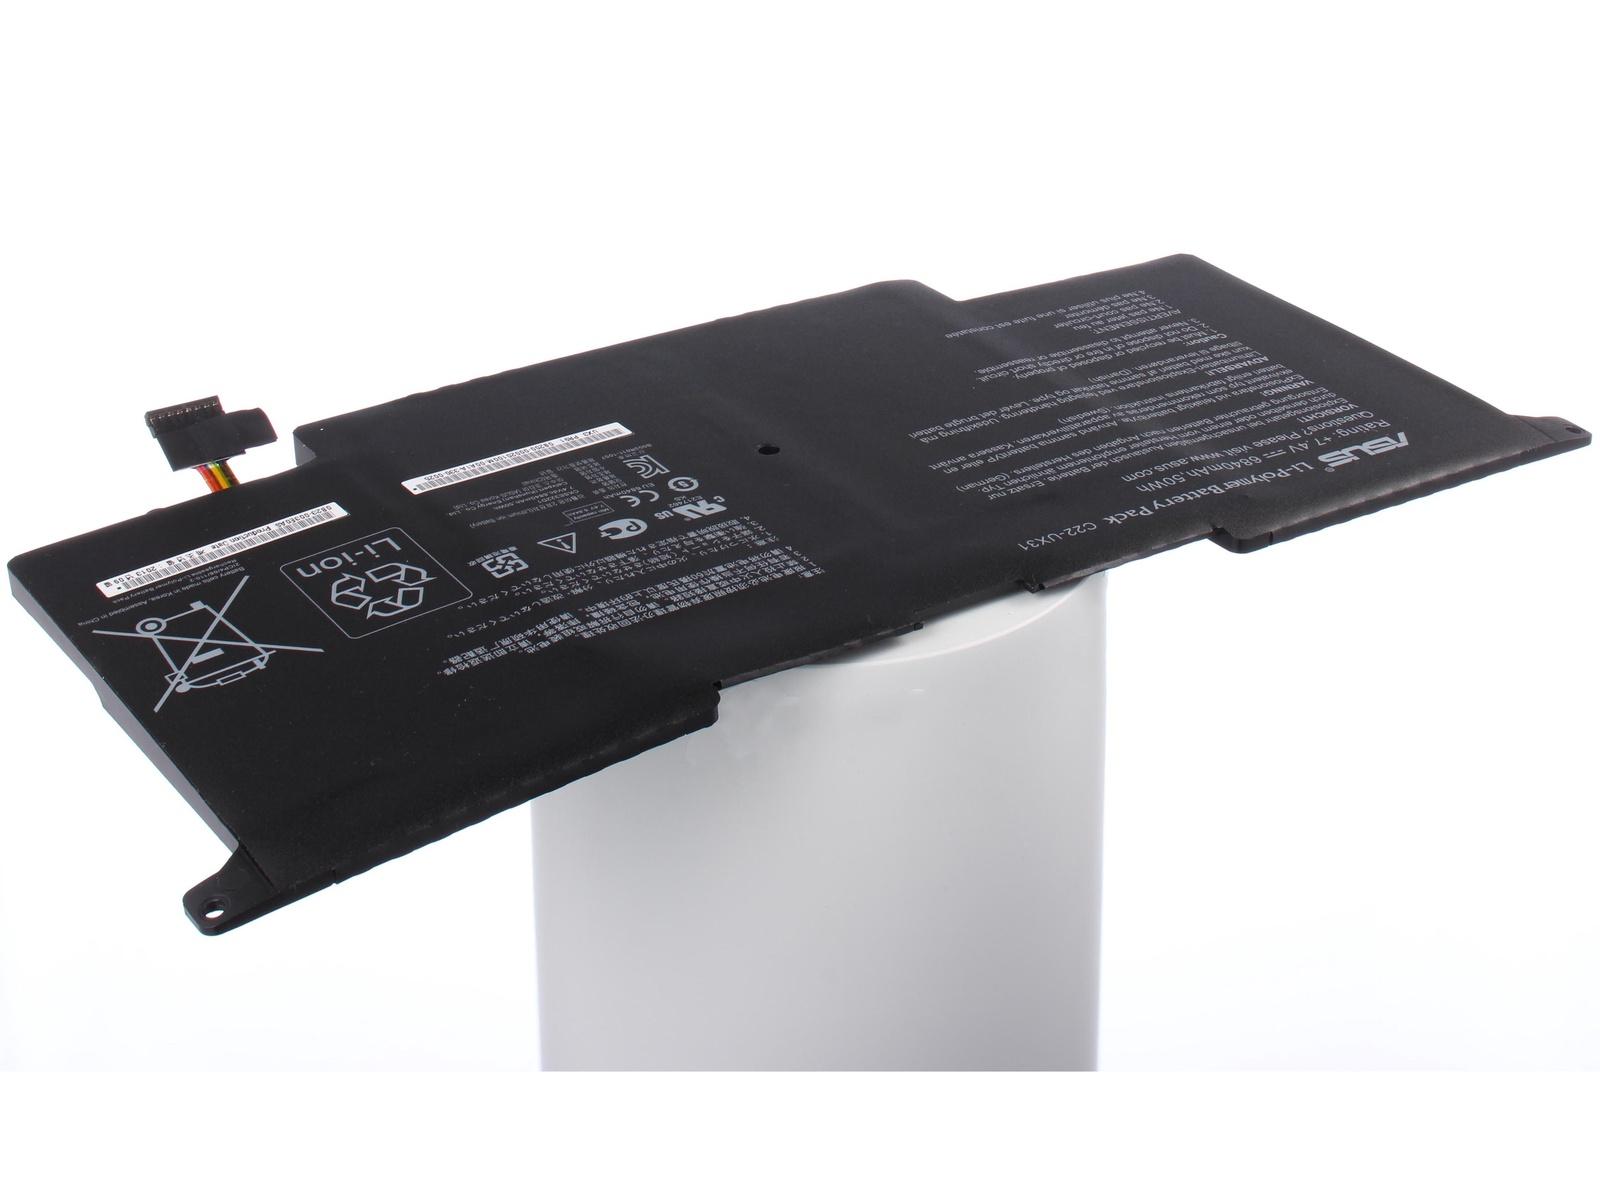 Фото - Аккумулятор для ноутбука iBatt Asus C22-UX31 аккумулятор